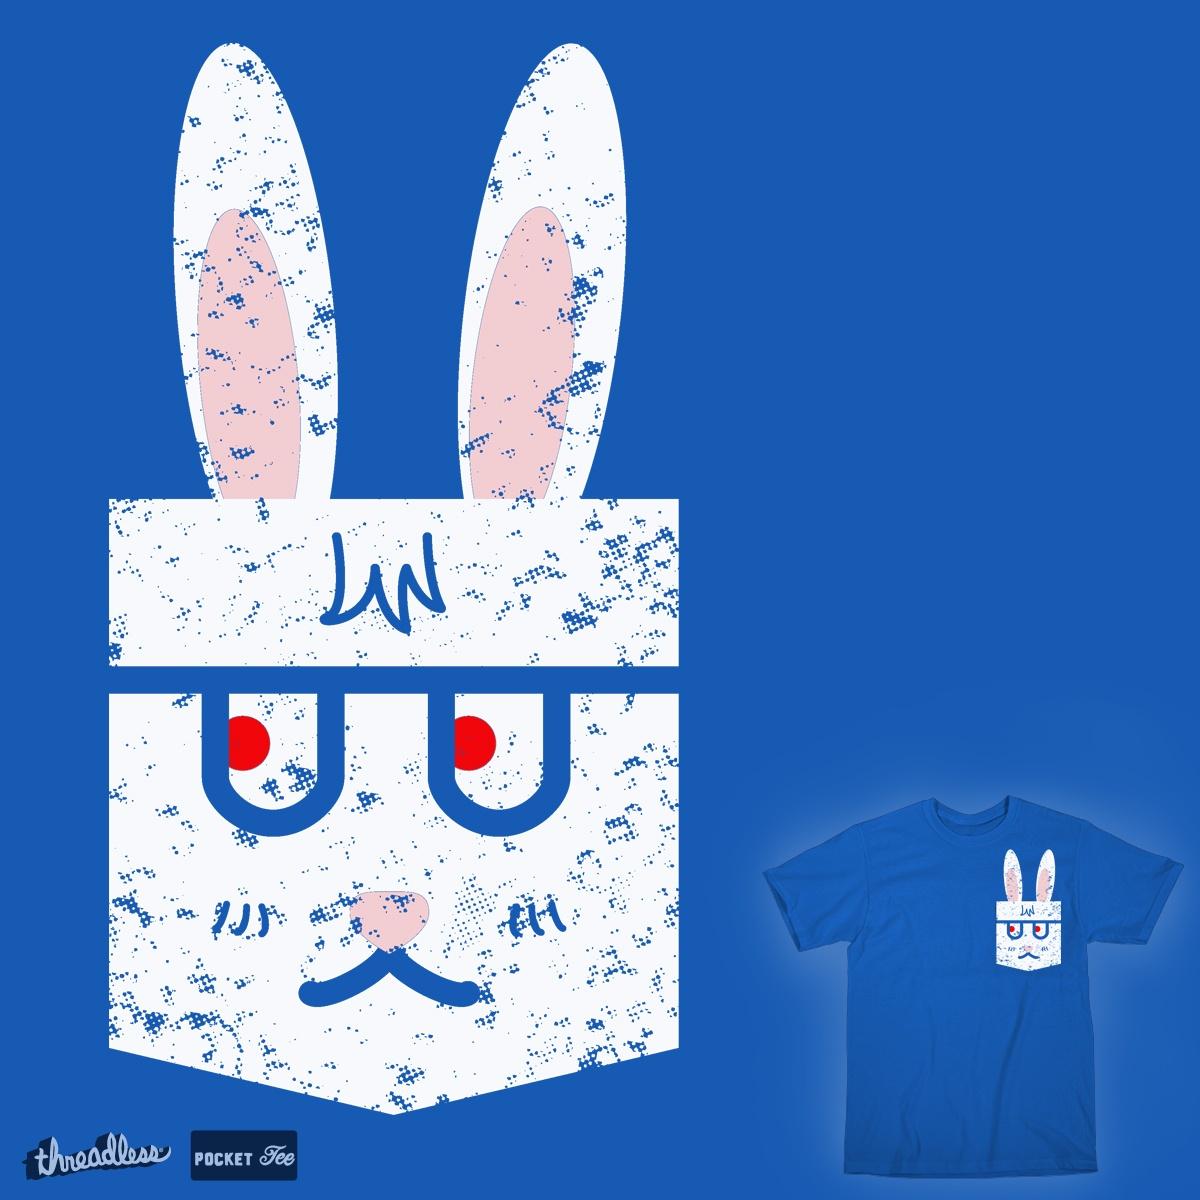 Pocket rabbit by k-mano on Threadless